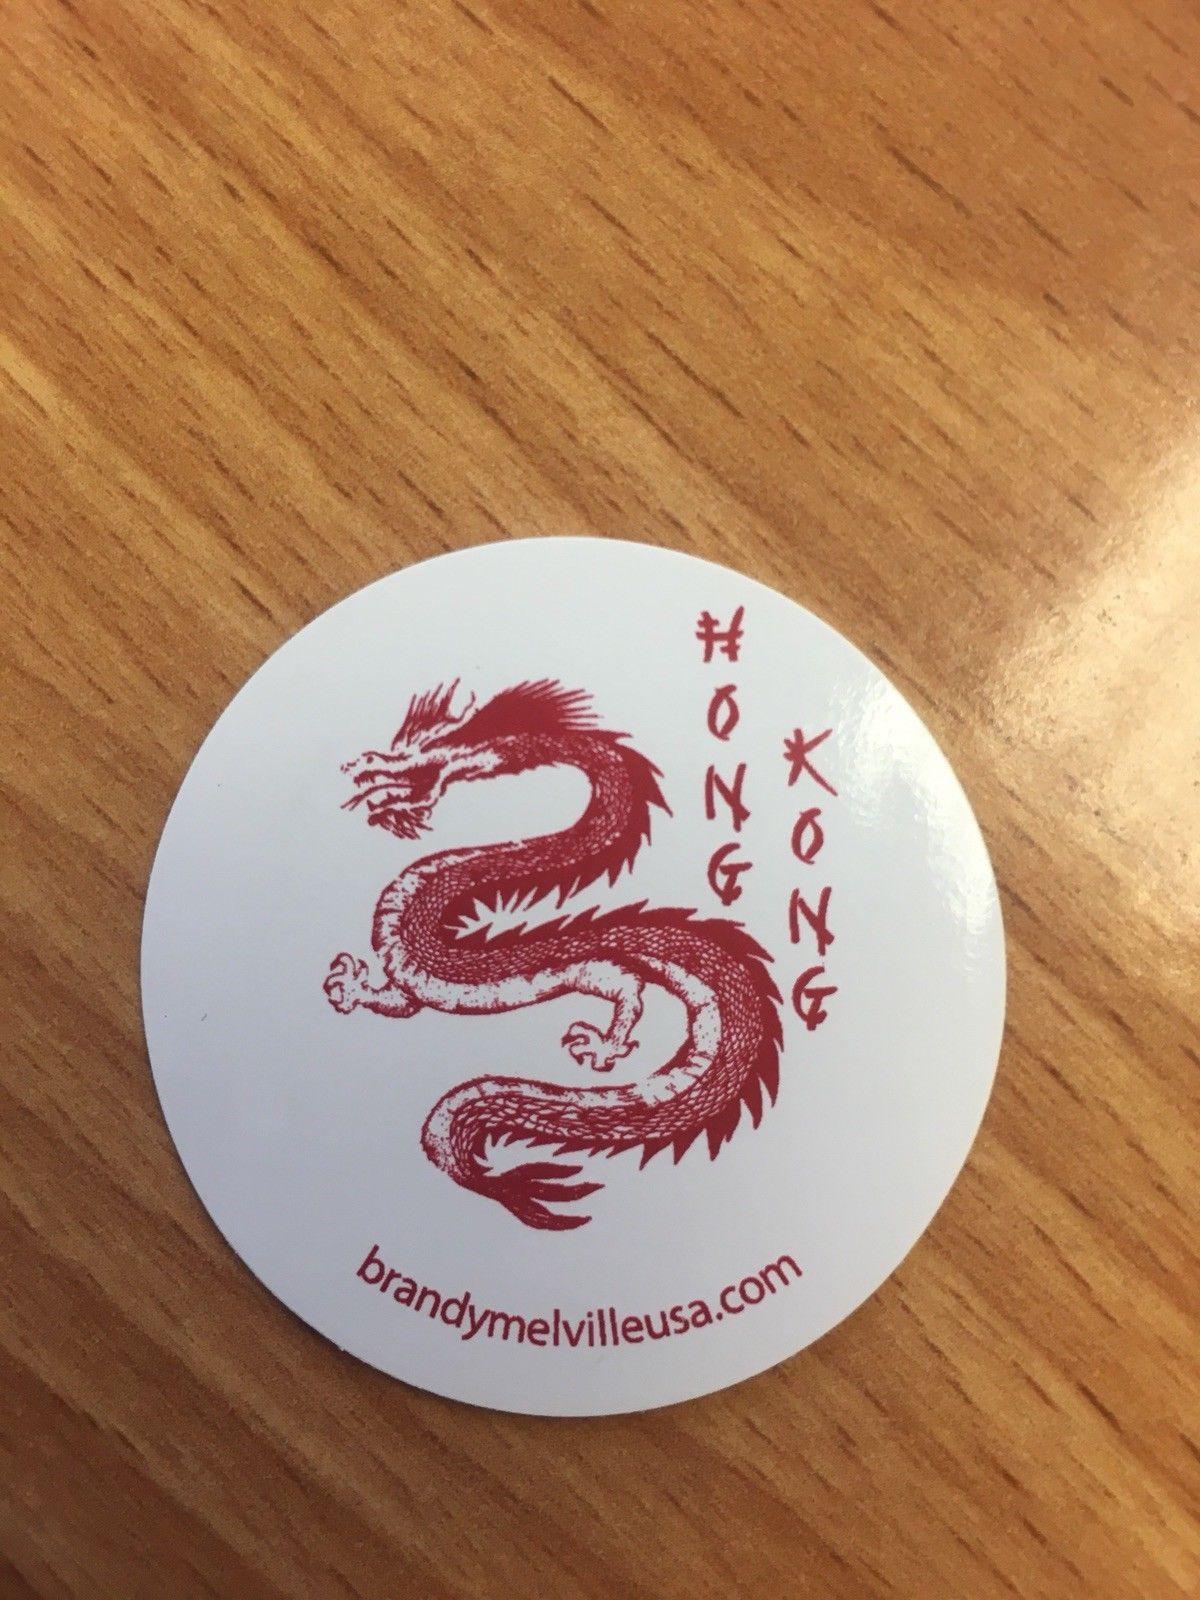 5575e1b39b 10 RARE BRANDY Melville Stickers - $3.25 | PicClick ...